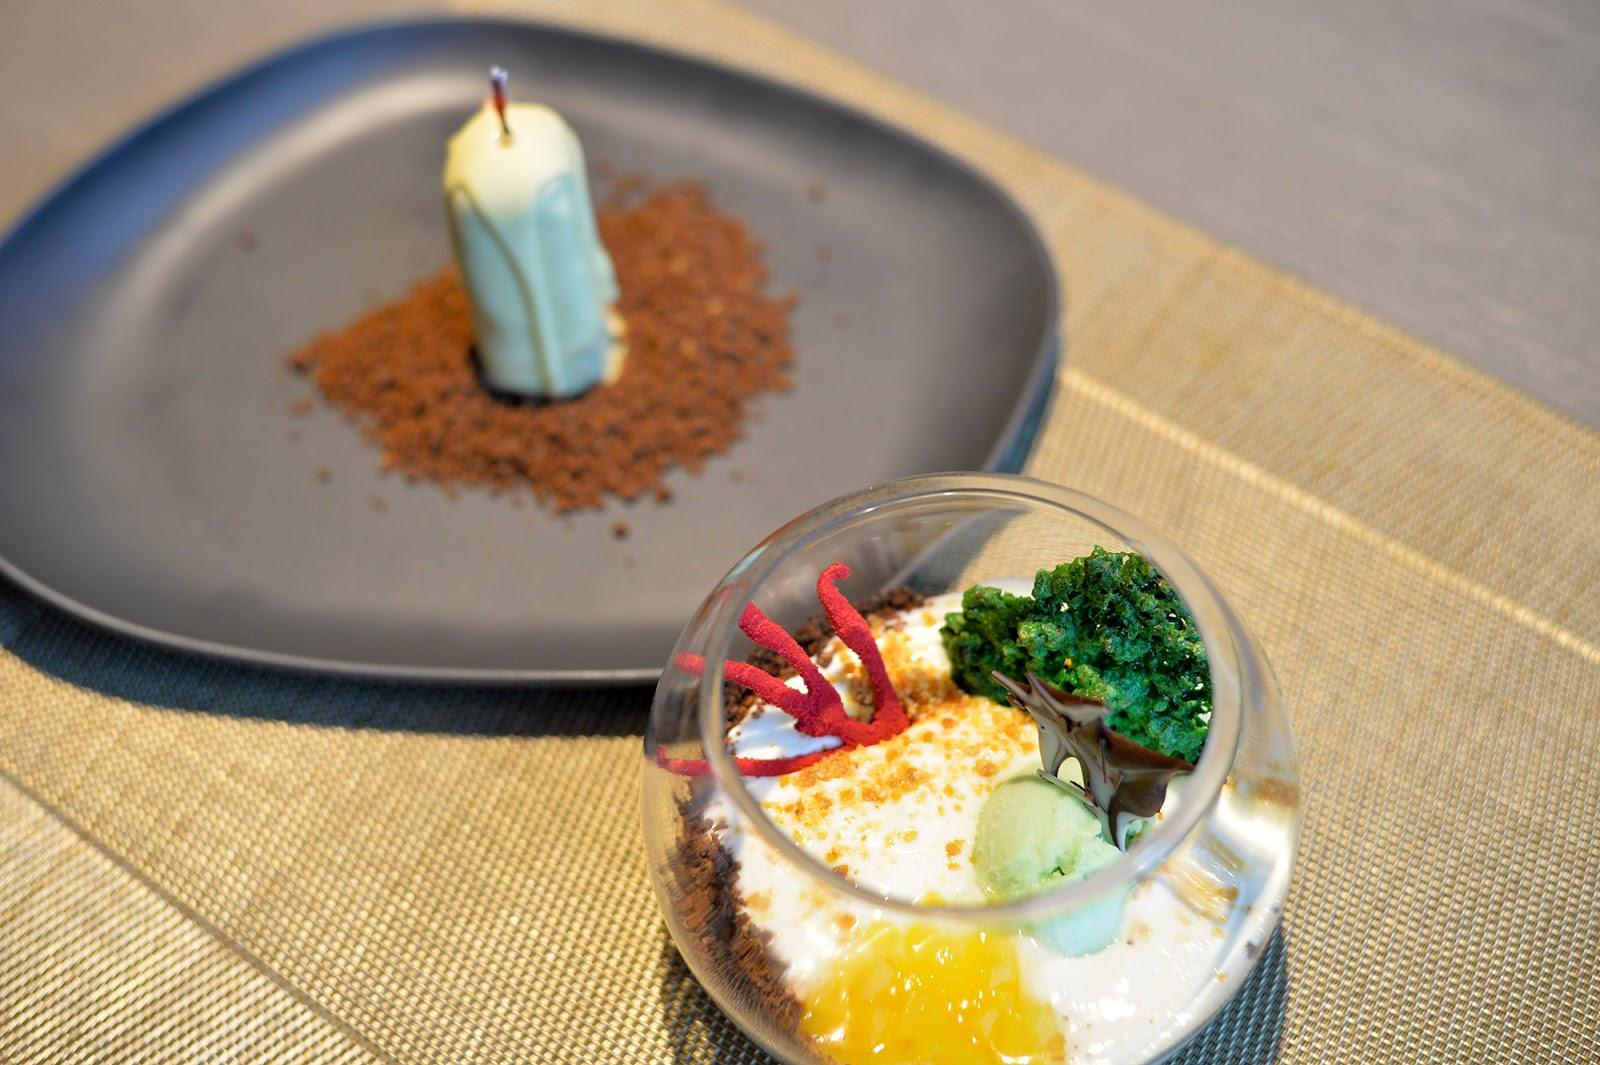 nimu azotea rooftop restaurant leon dessert vela candle cumpleaños birthday fish bowl pecera